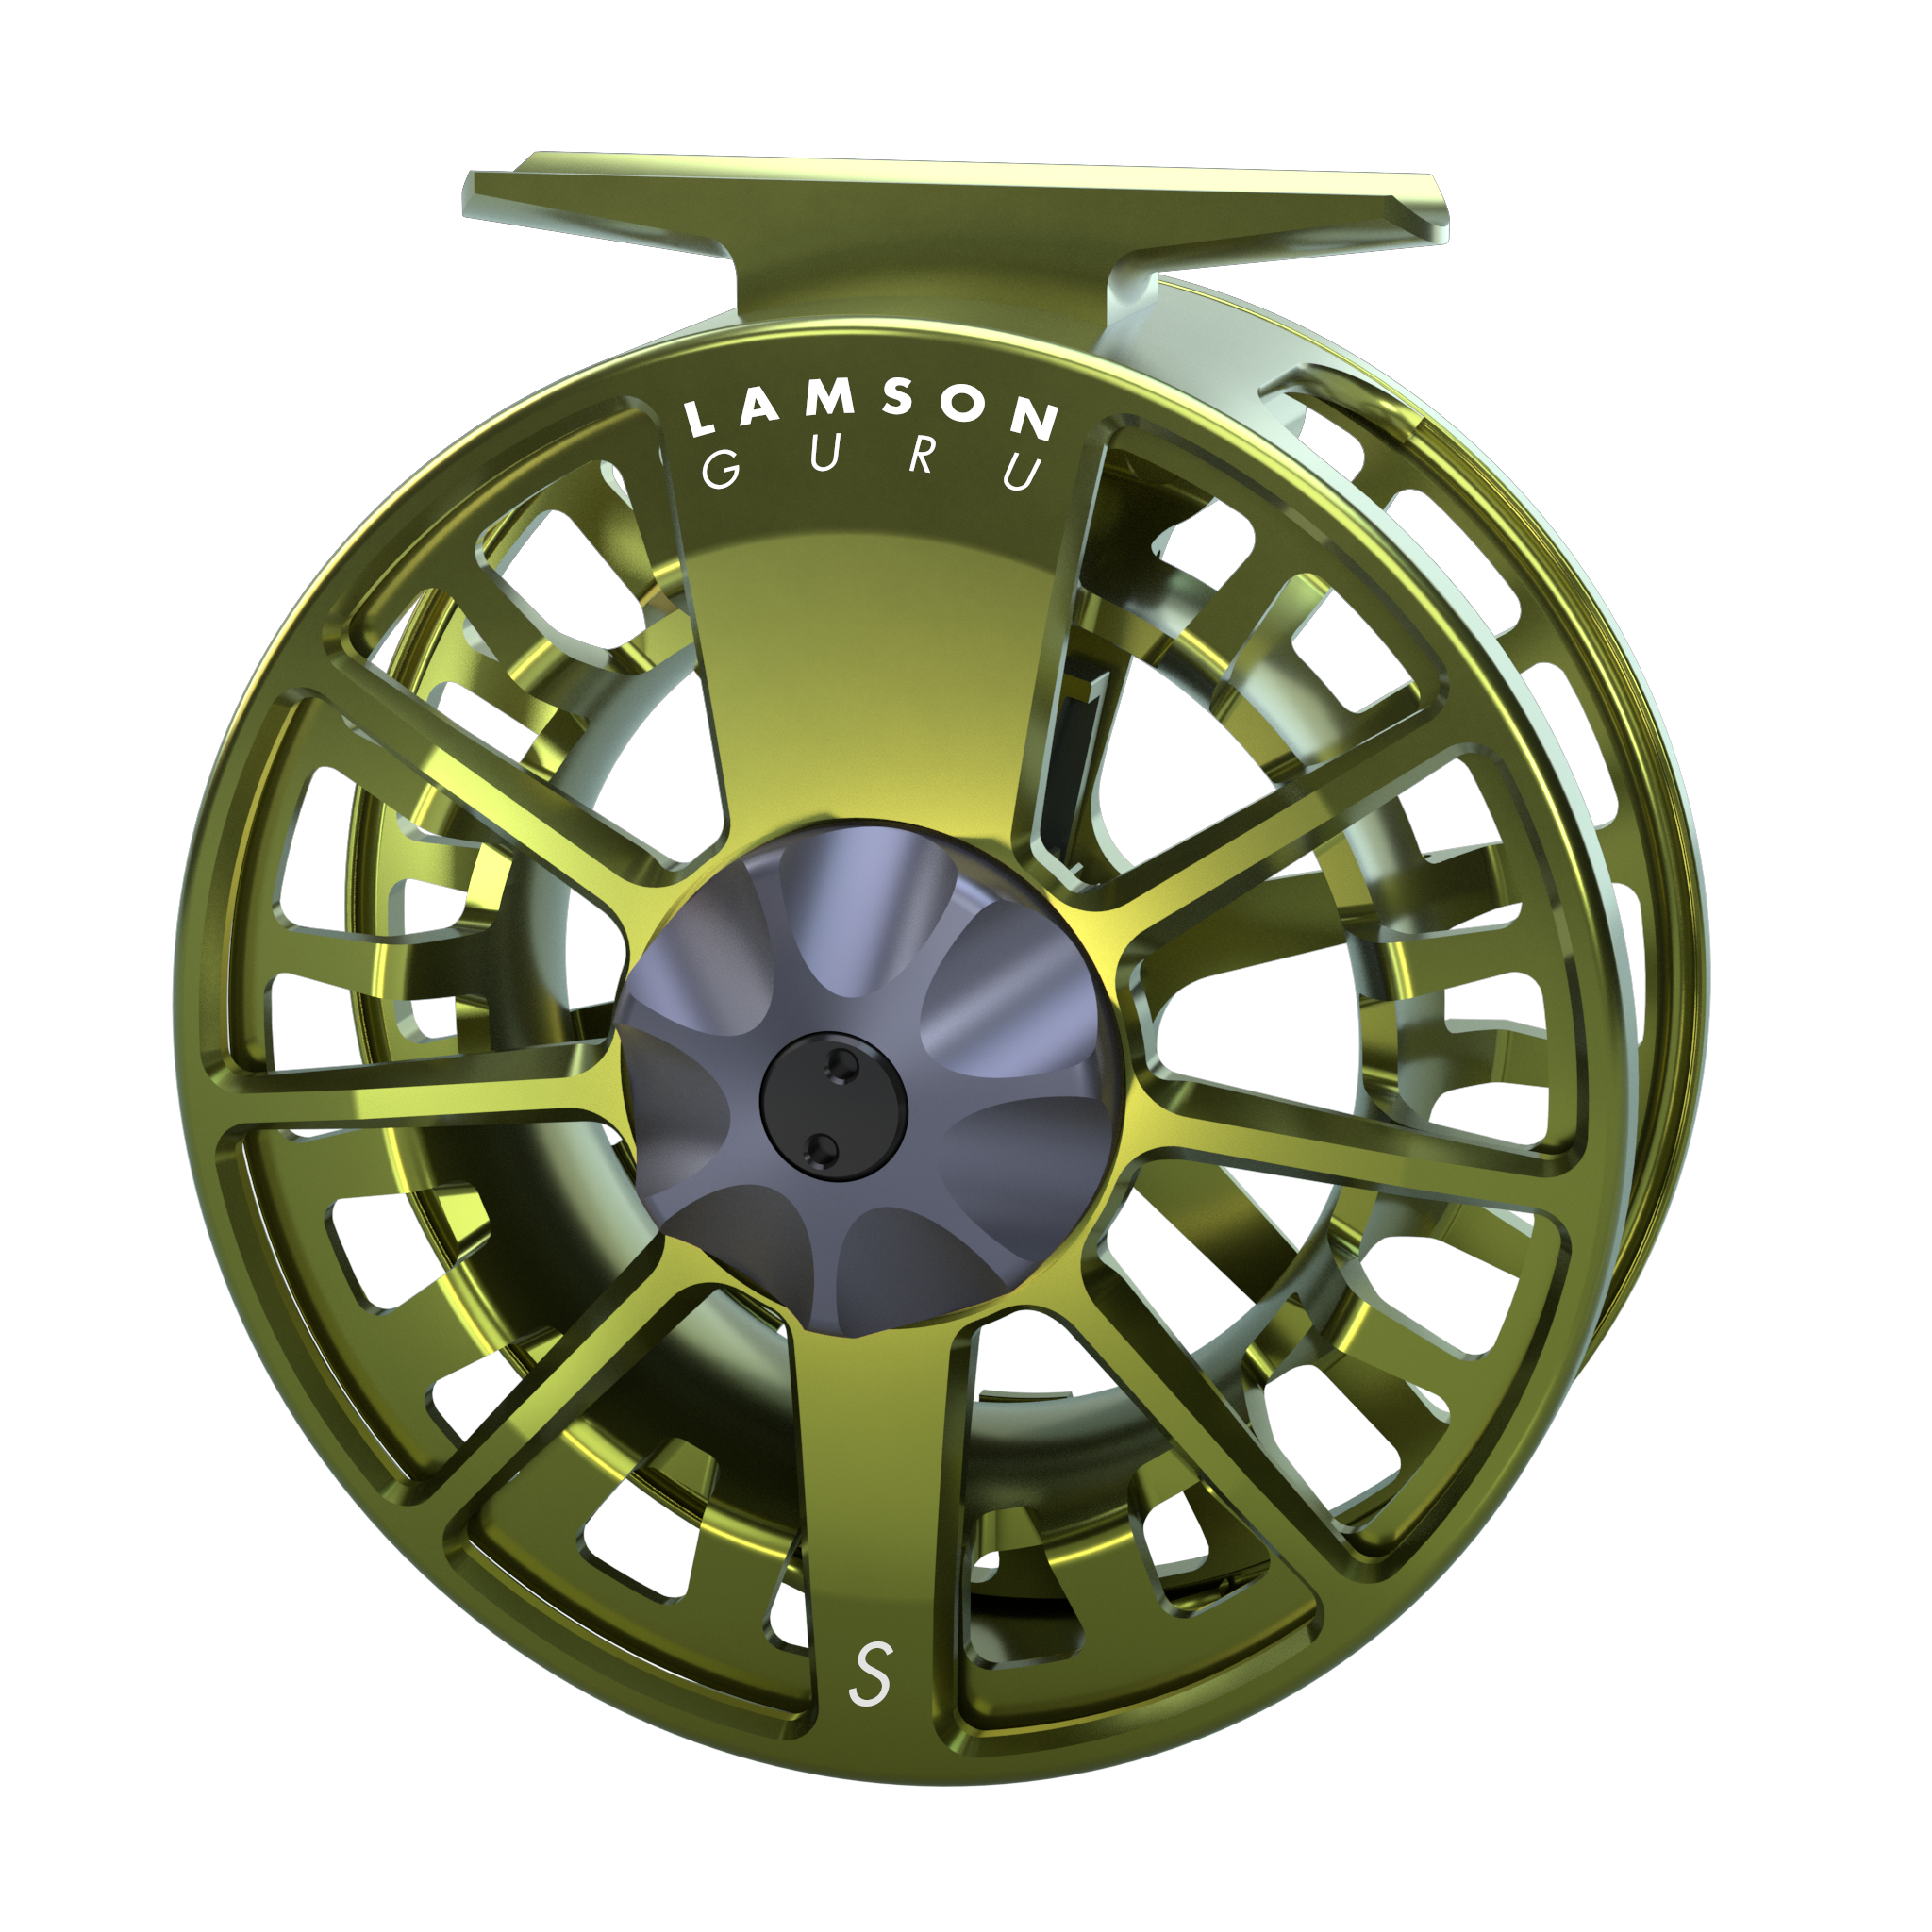 Waterworks Lamson Lamson Guru S-Series Reel